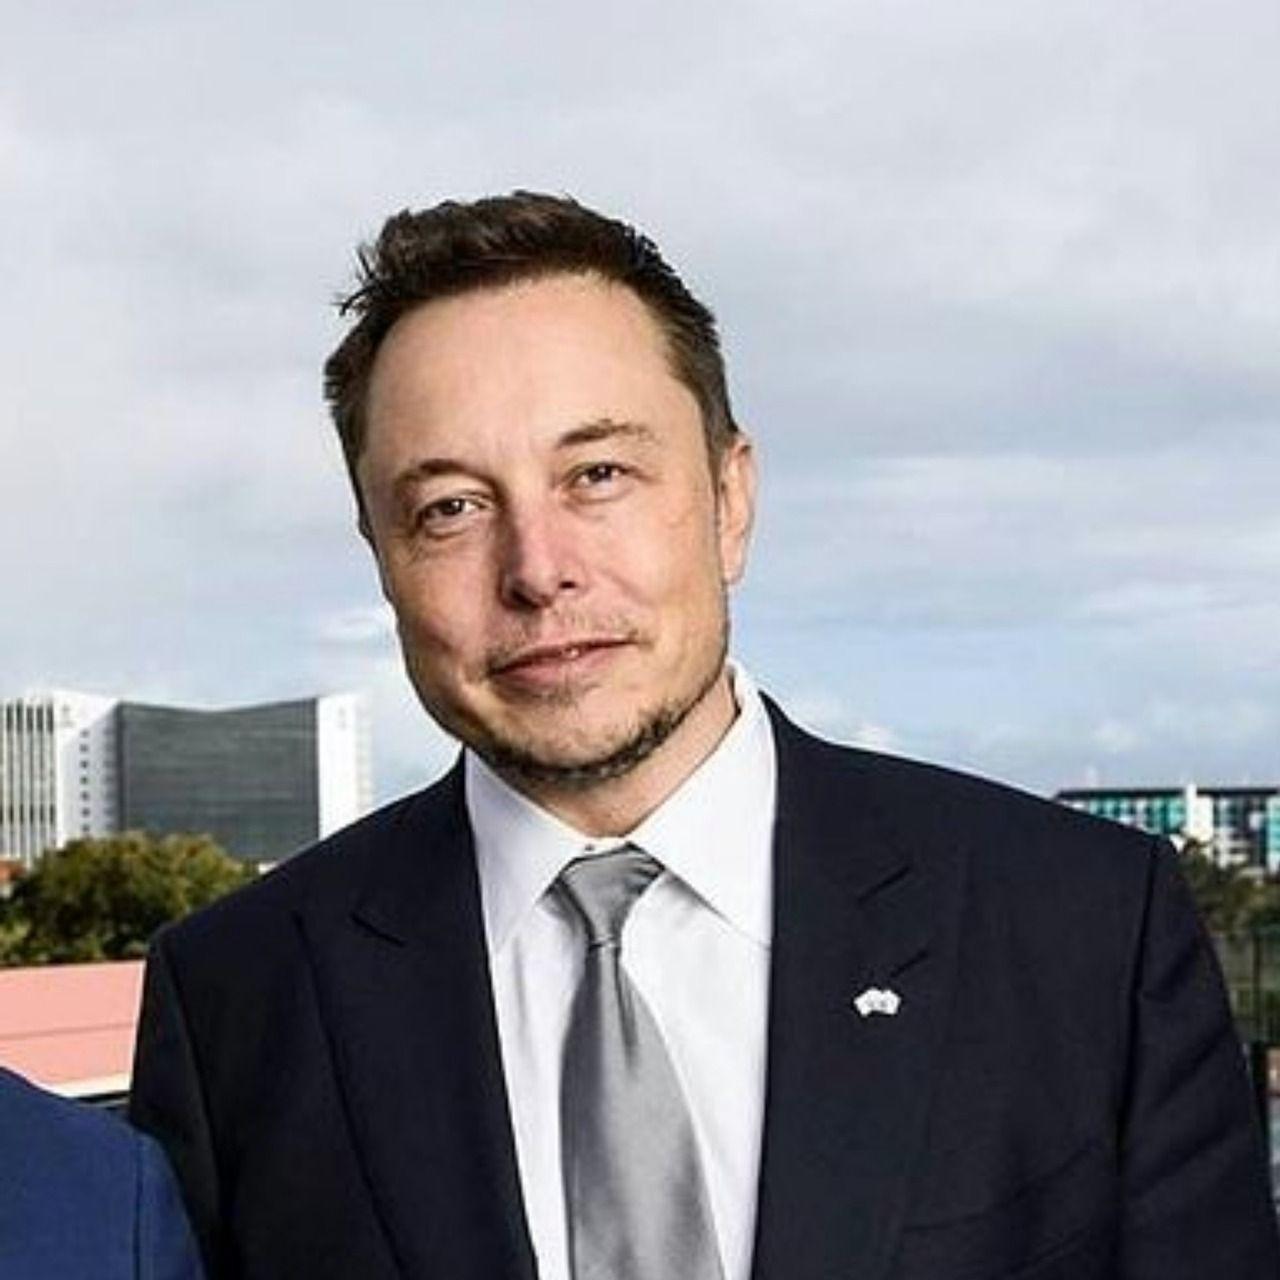 Elon Musk Elon Musk Elon Musk Spacex Elon Musk Tesla